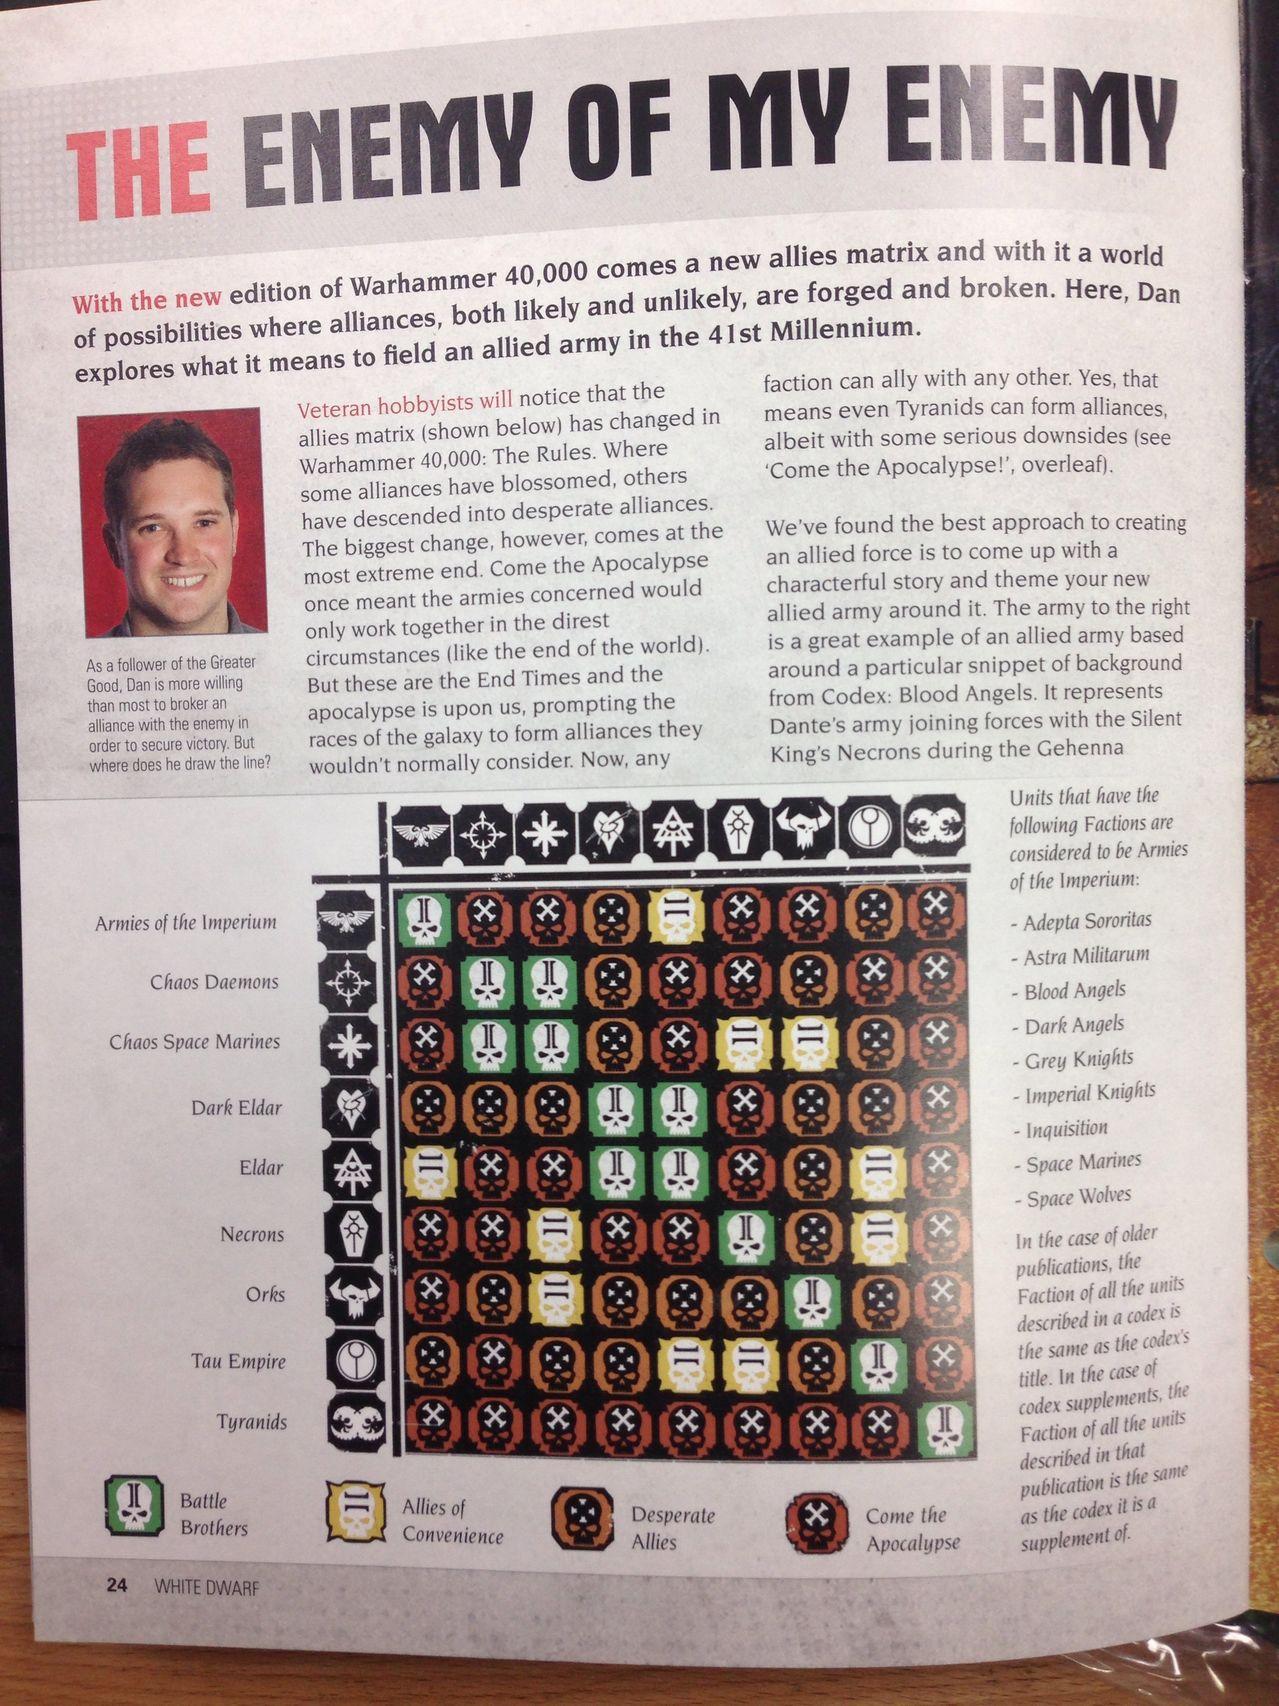 Warhammer 40k classic edition,warhammer 40000,warhammer40000, warhammer40k, warhammer 40k, ваха, сорокотысячник